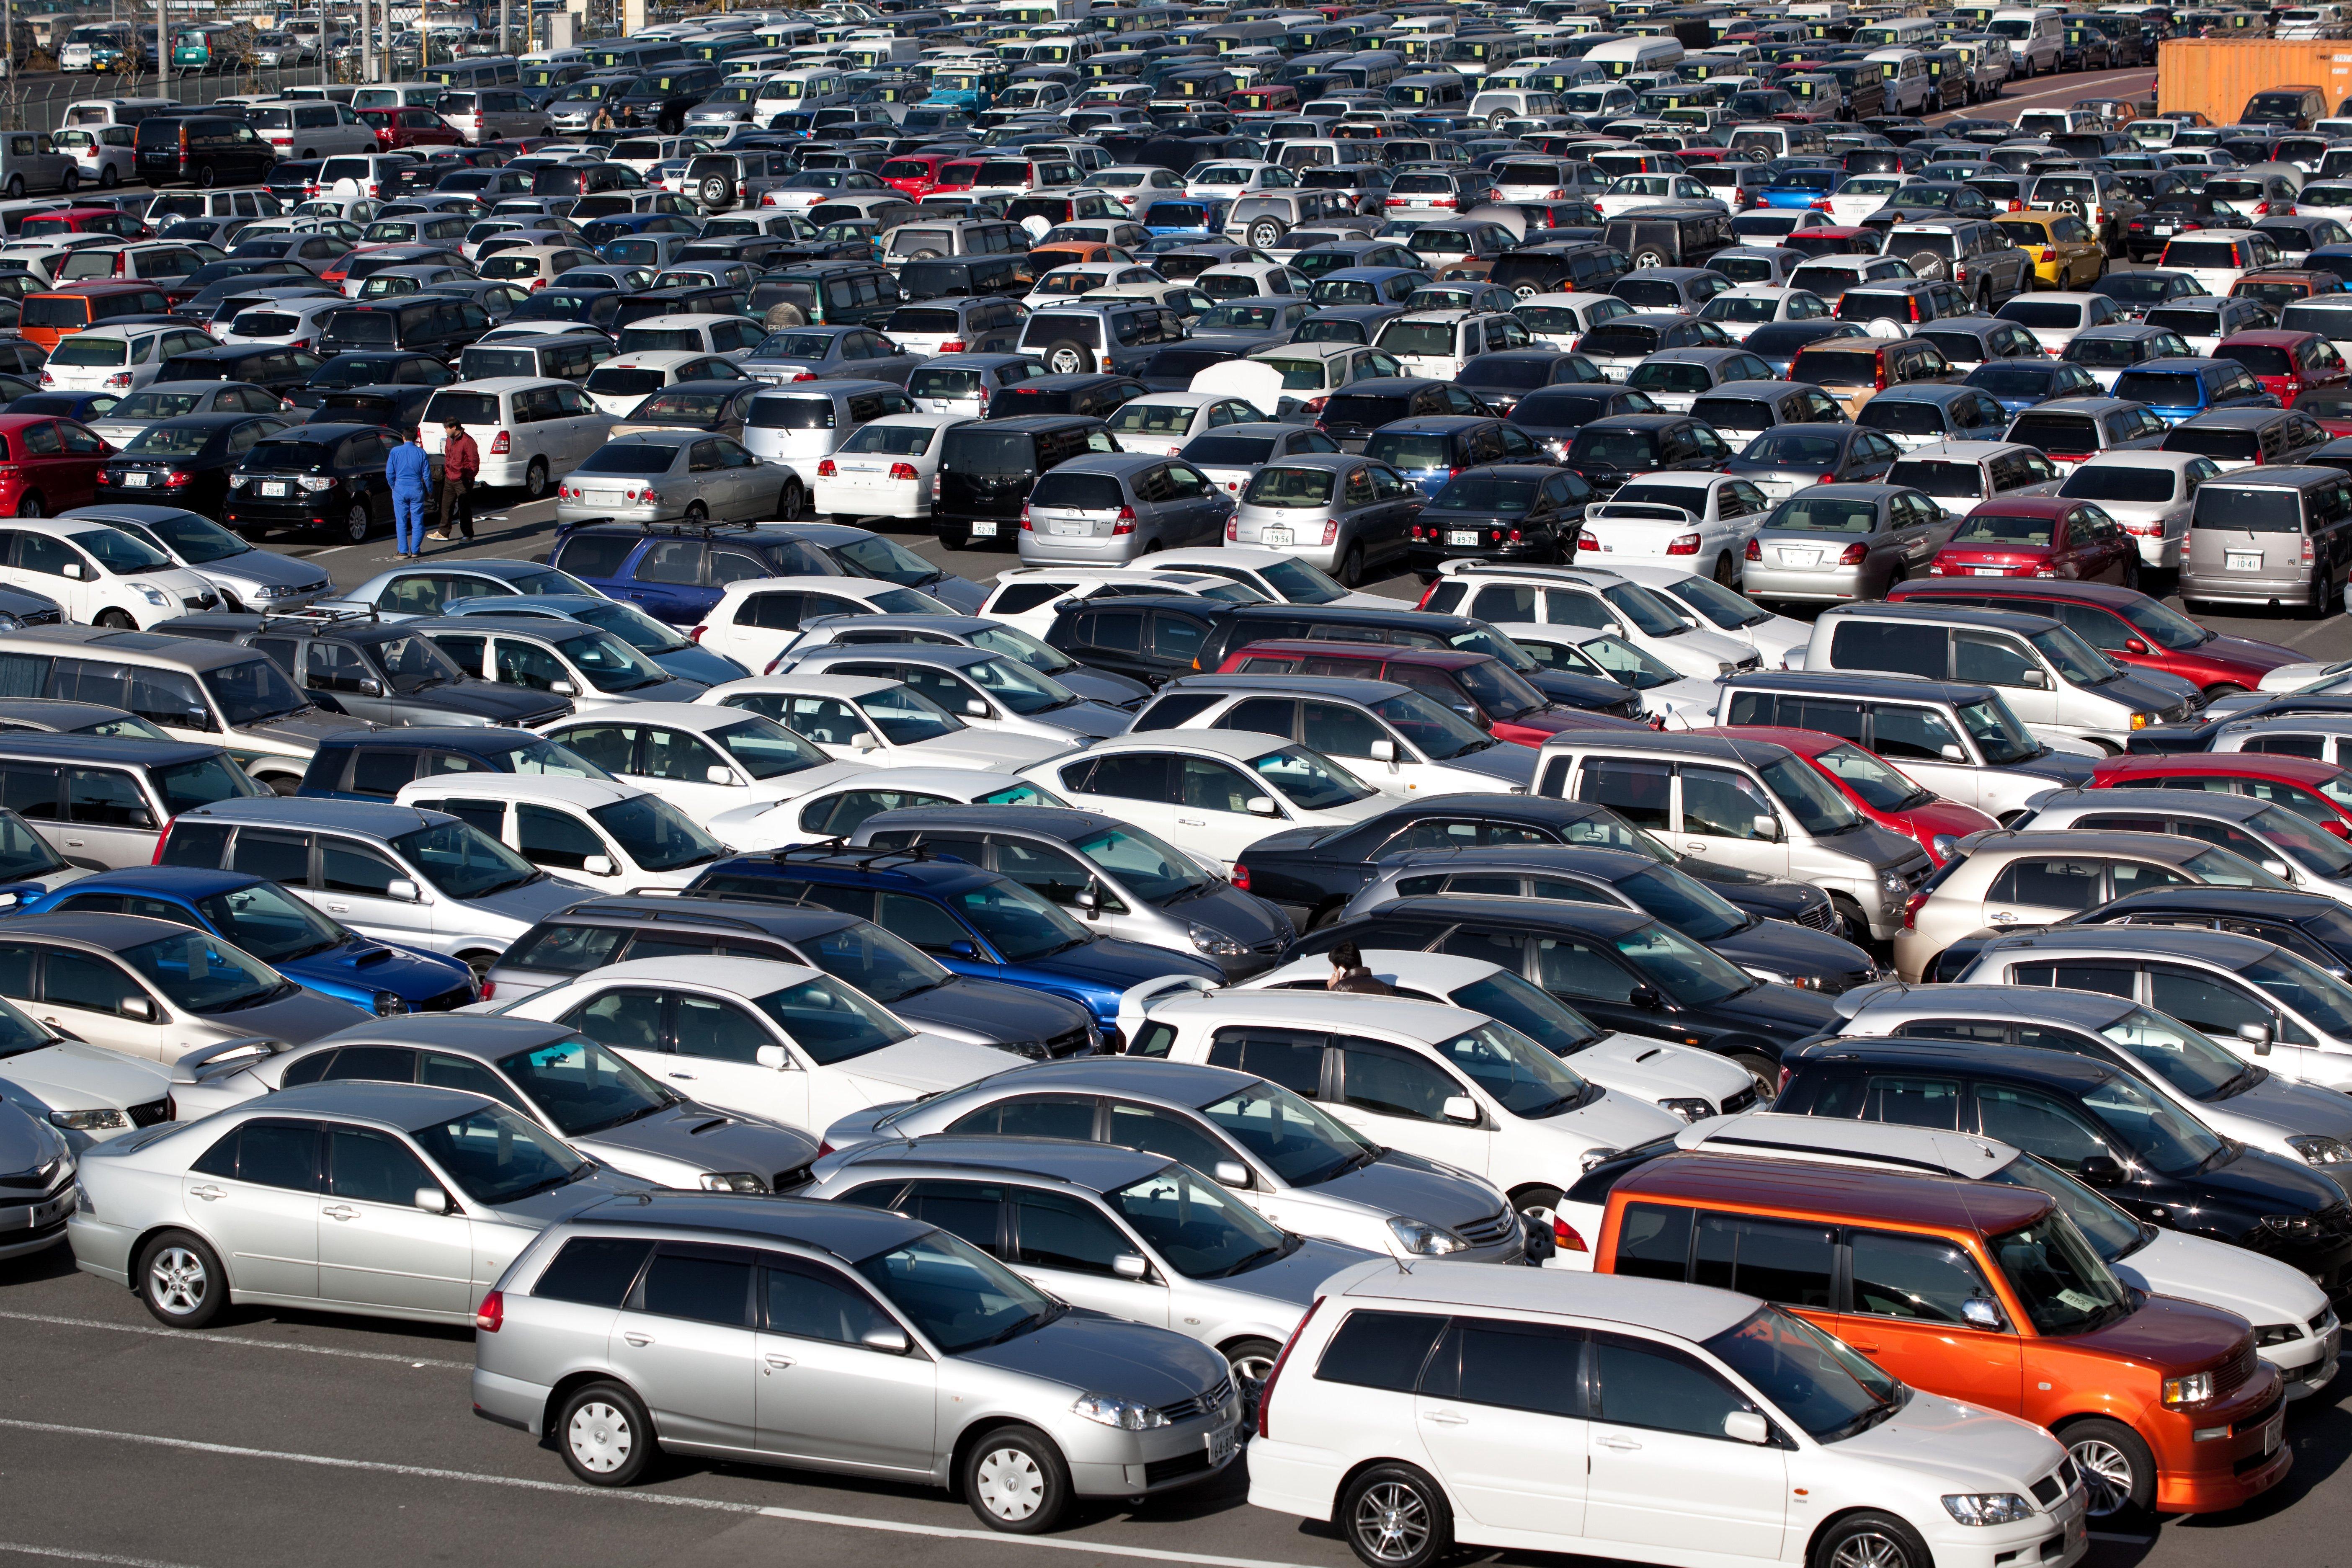 City investors set to acquire British Car Auctions for £1 ...